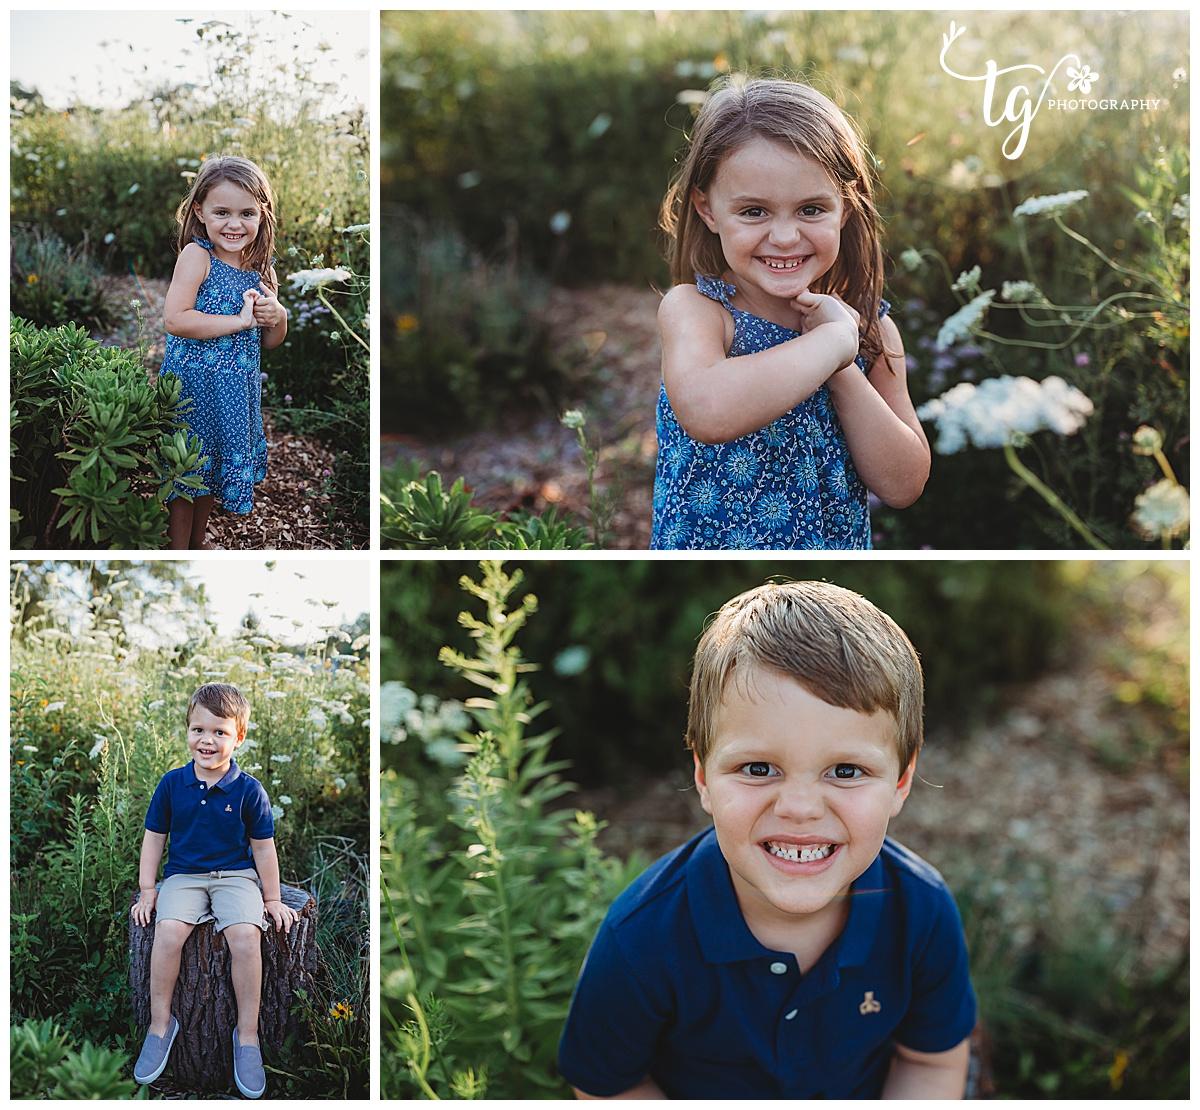 birthday photographer for outdoor photos